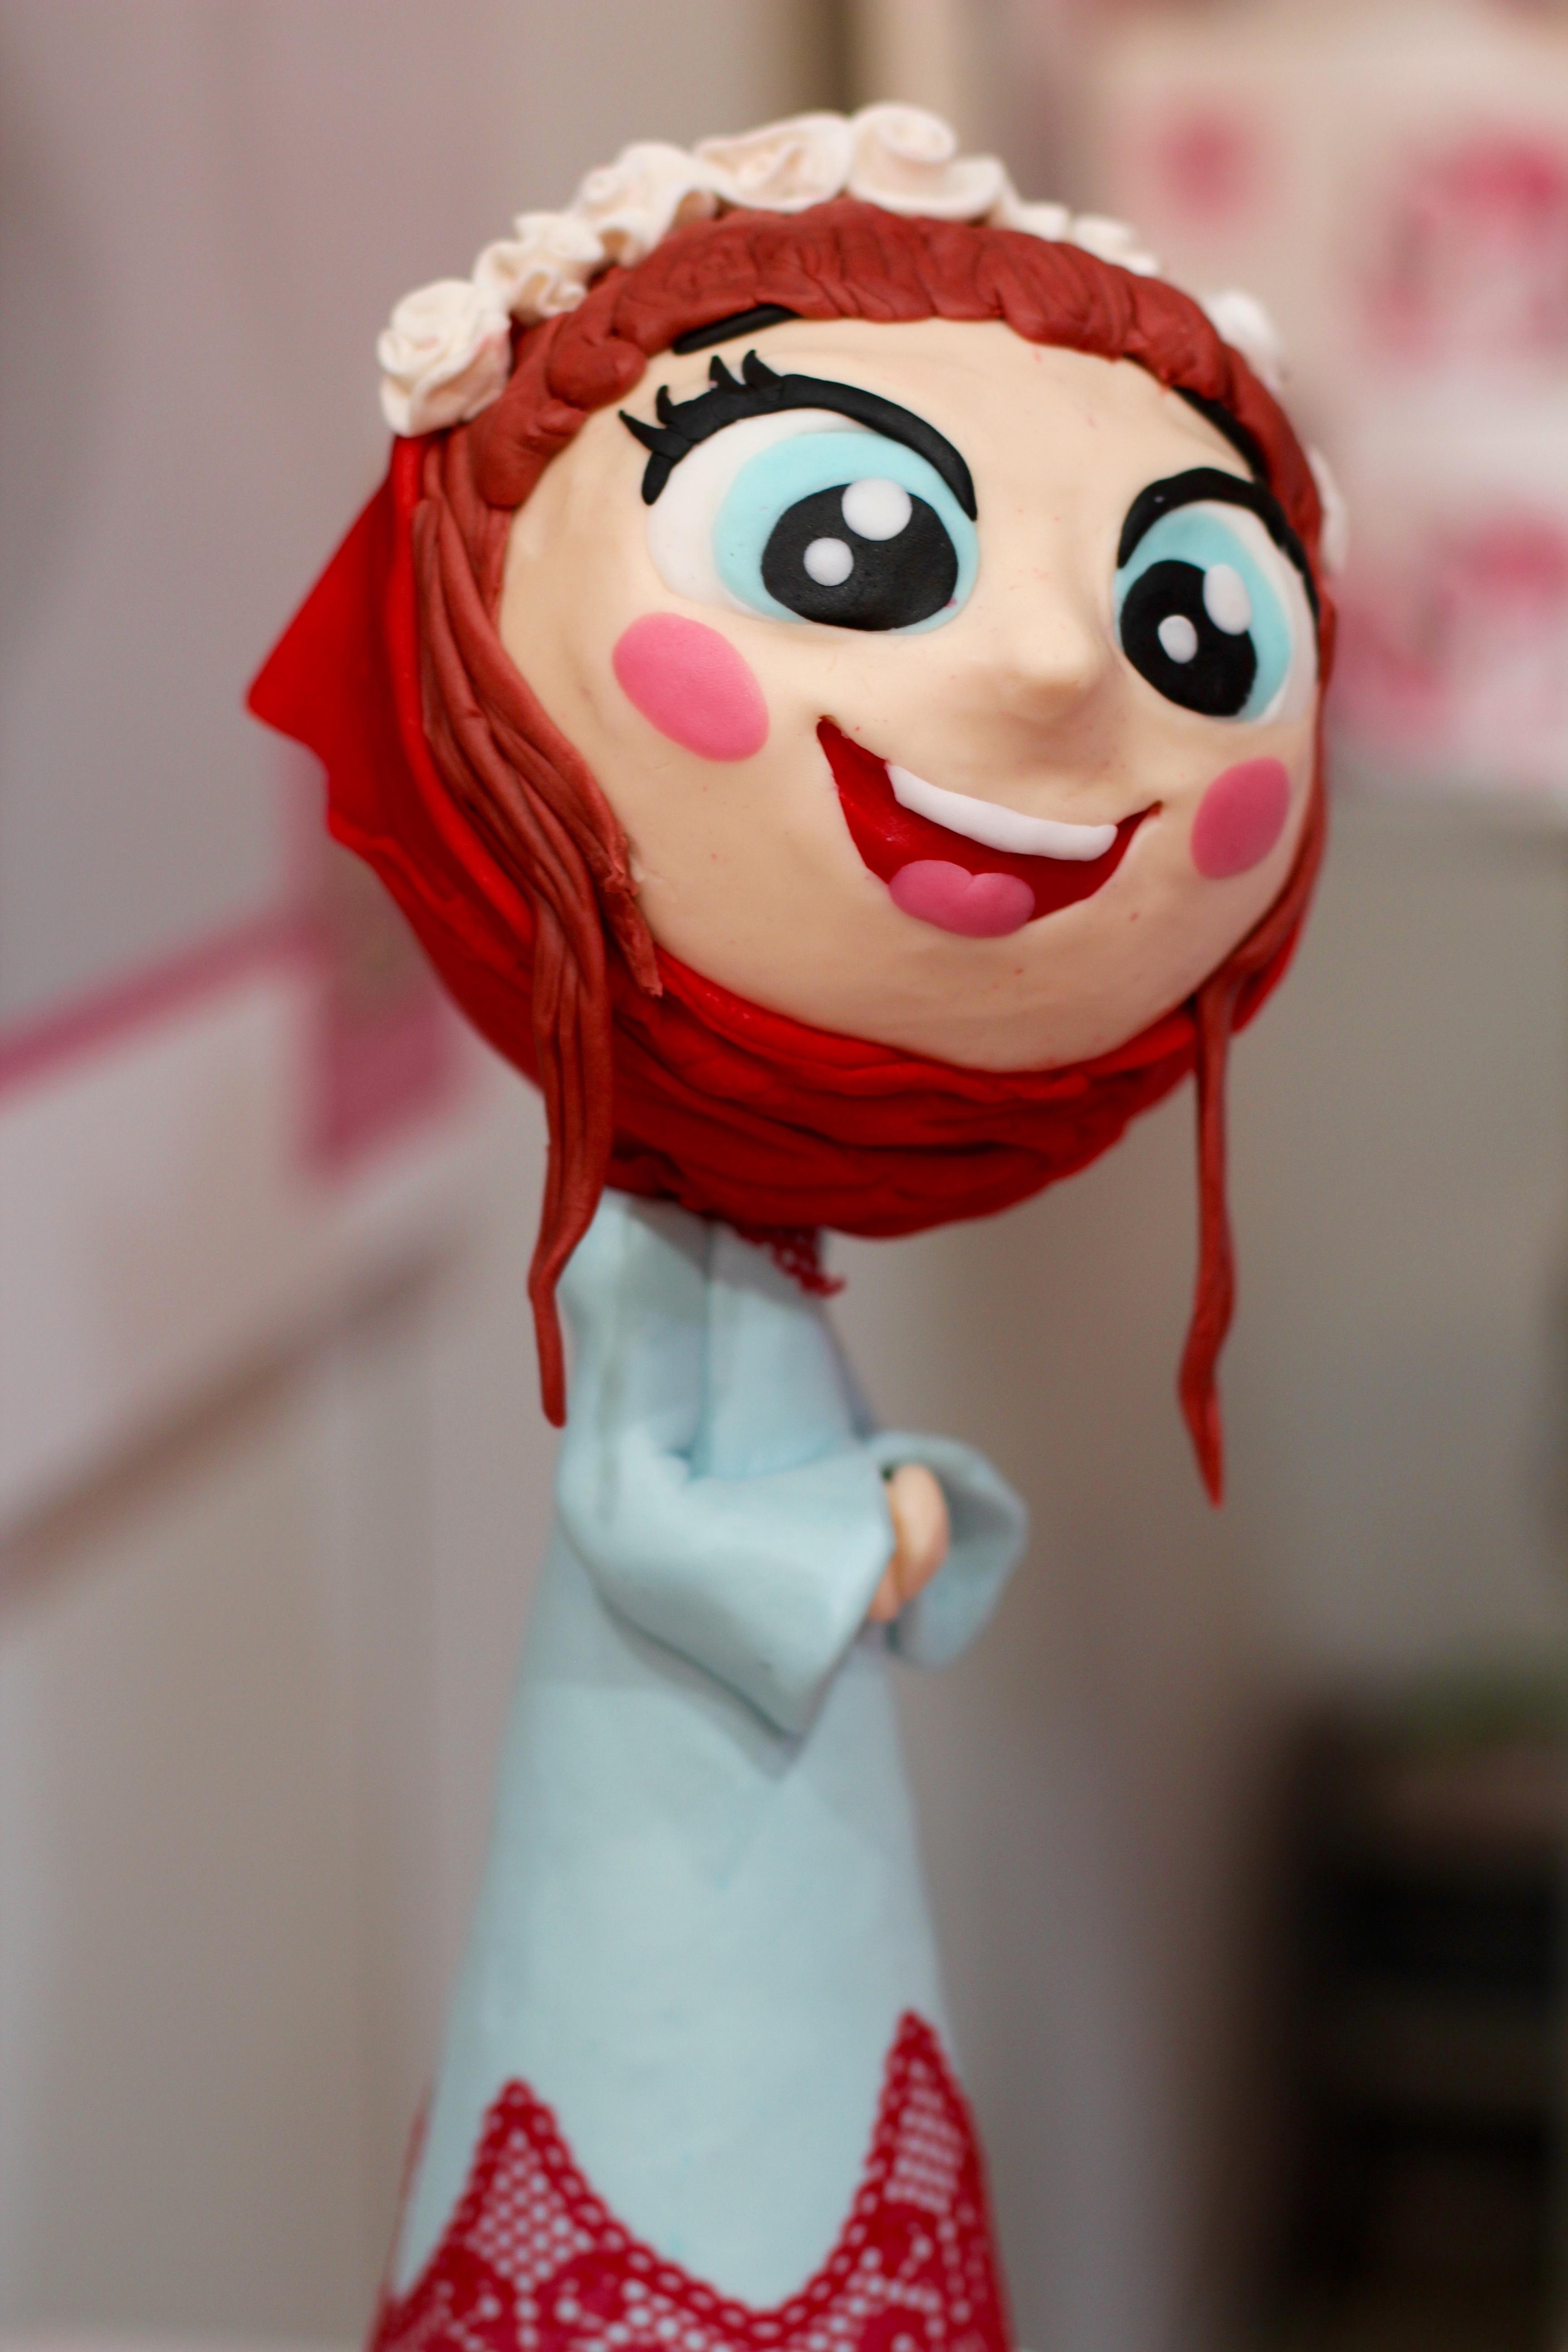 Gambar Putih Bunga Pakaian Berwarna Merah Muda Mainan Ara